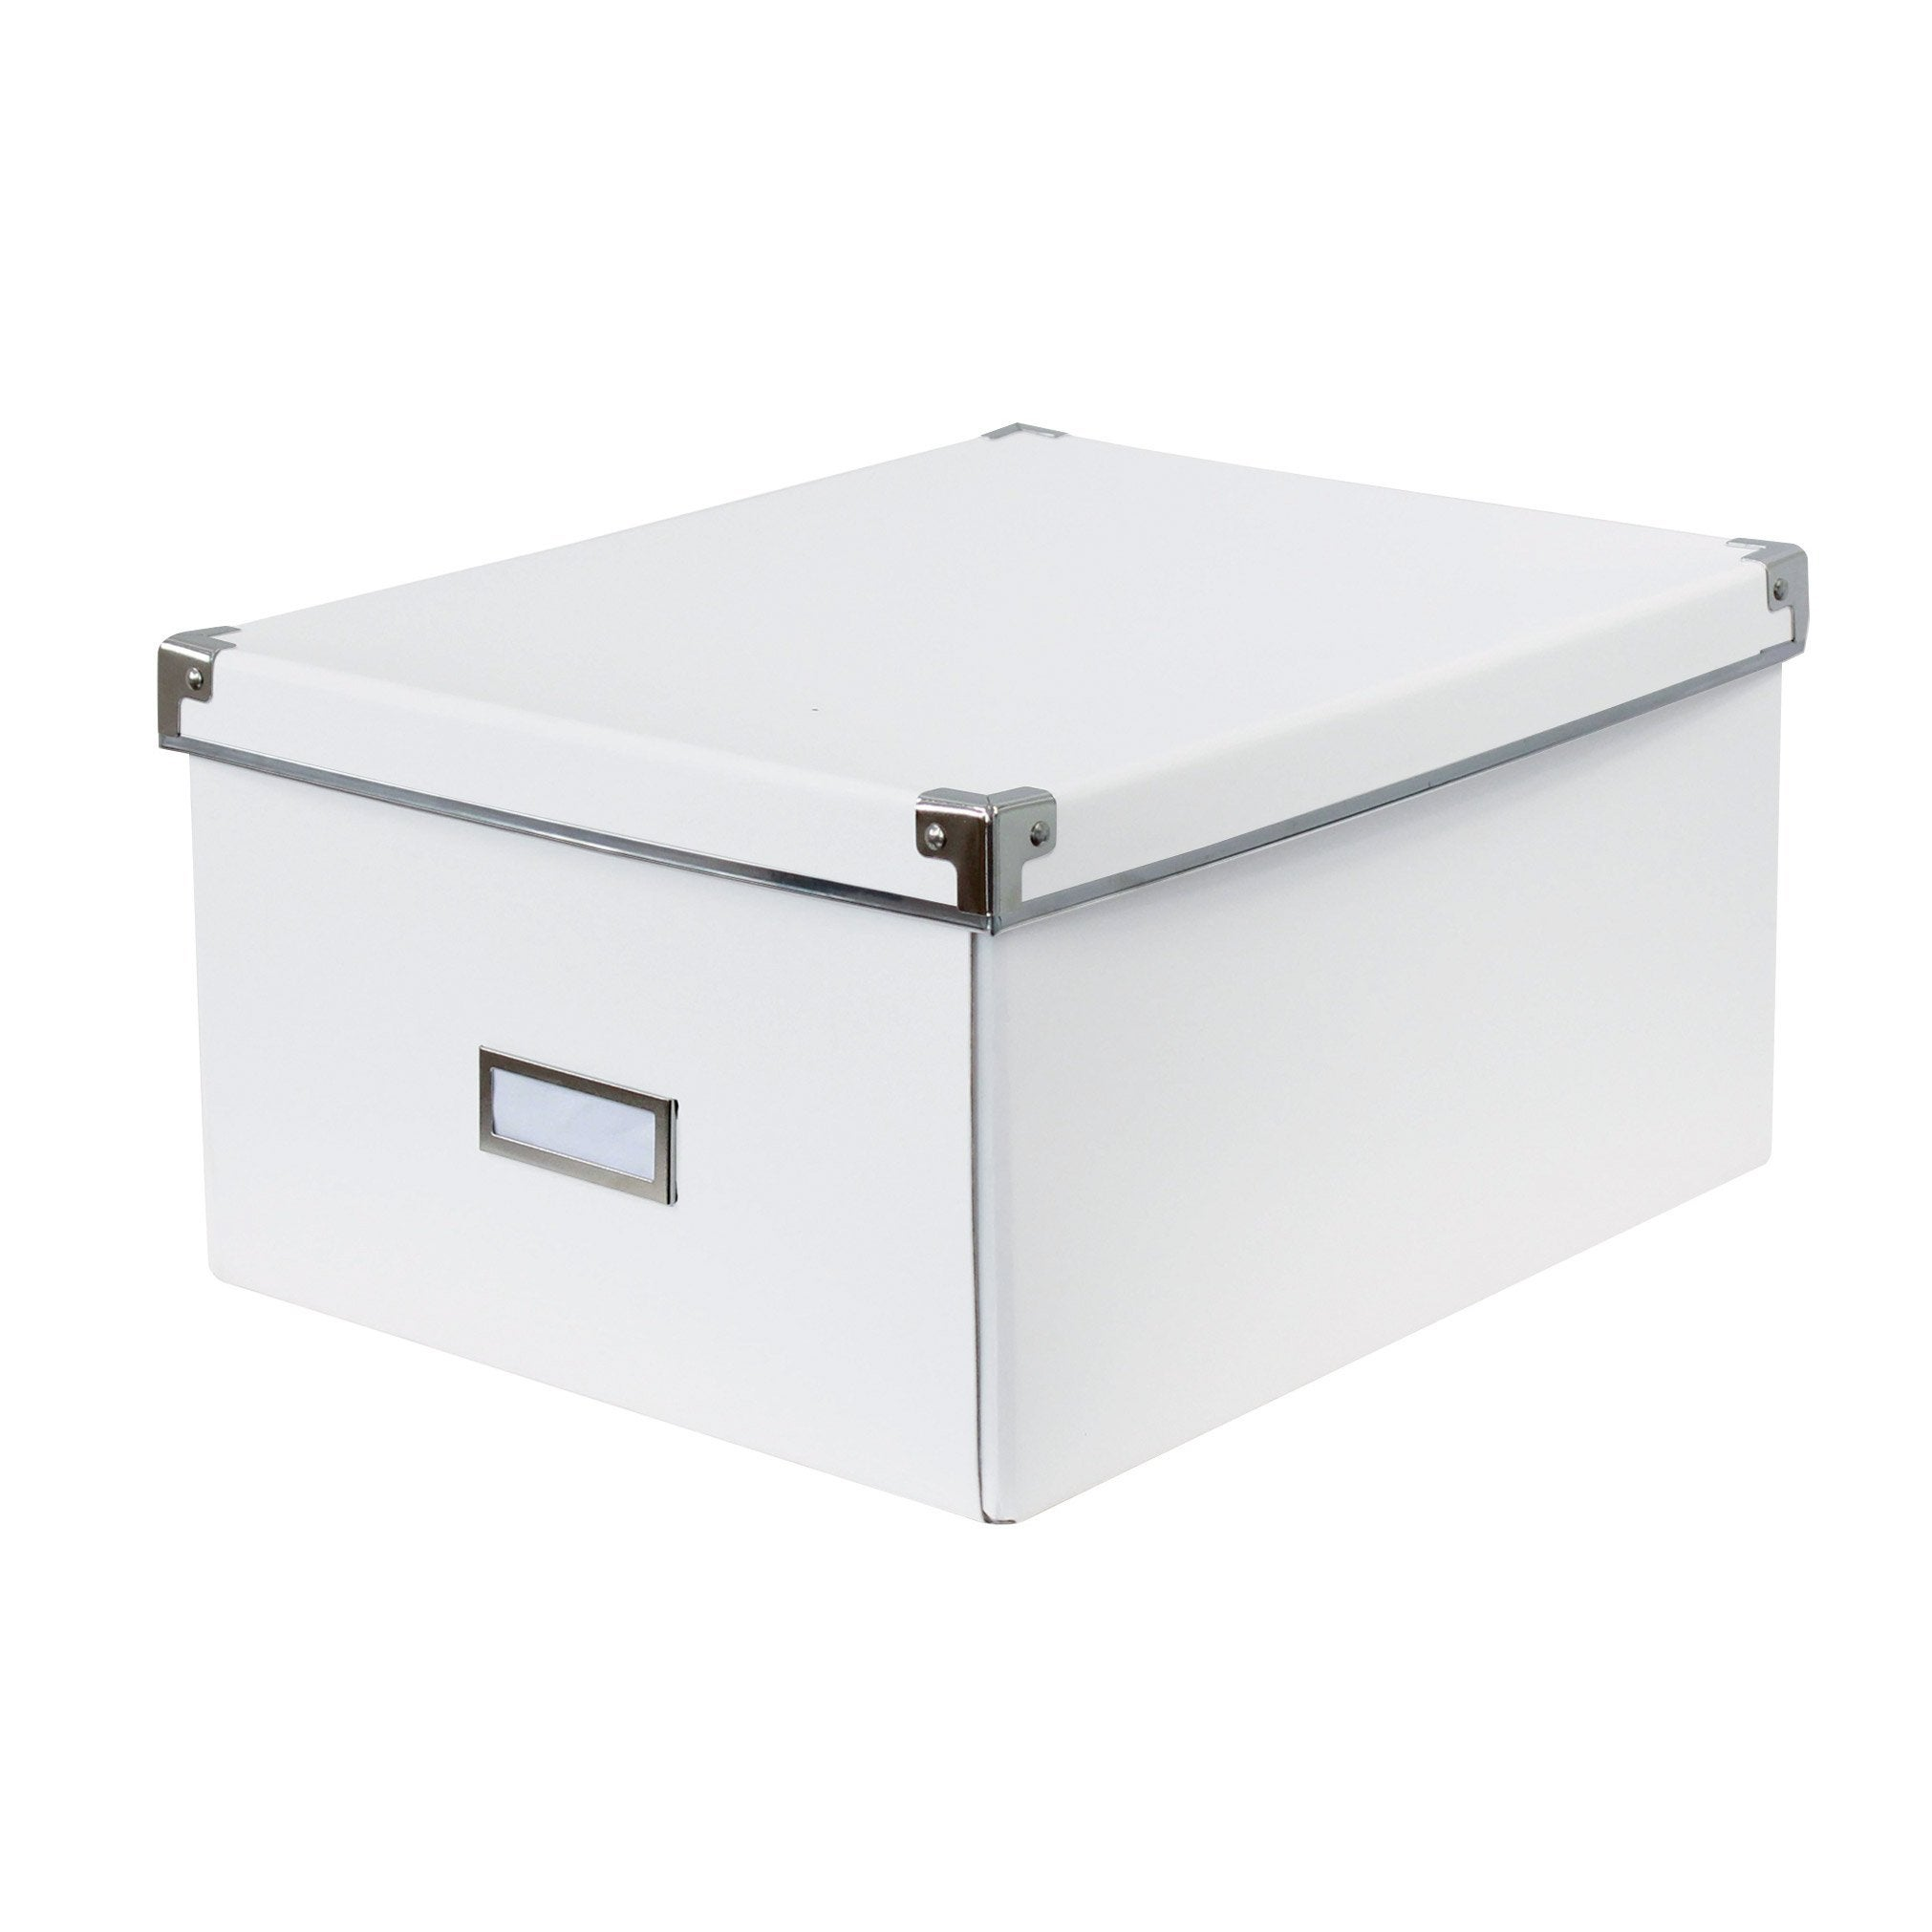 Boîte de rangement avec couvercle carton BOX & BEYOND blanc | Leroy Merlin